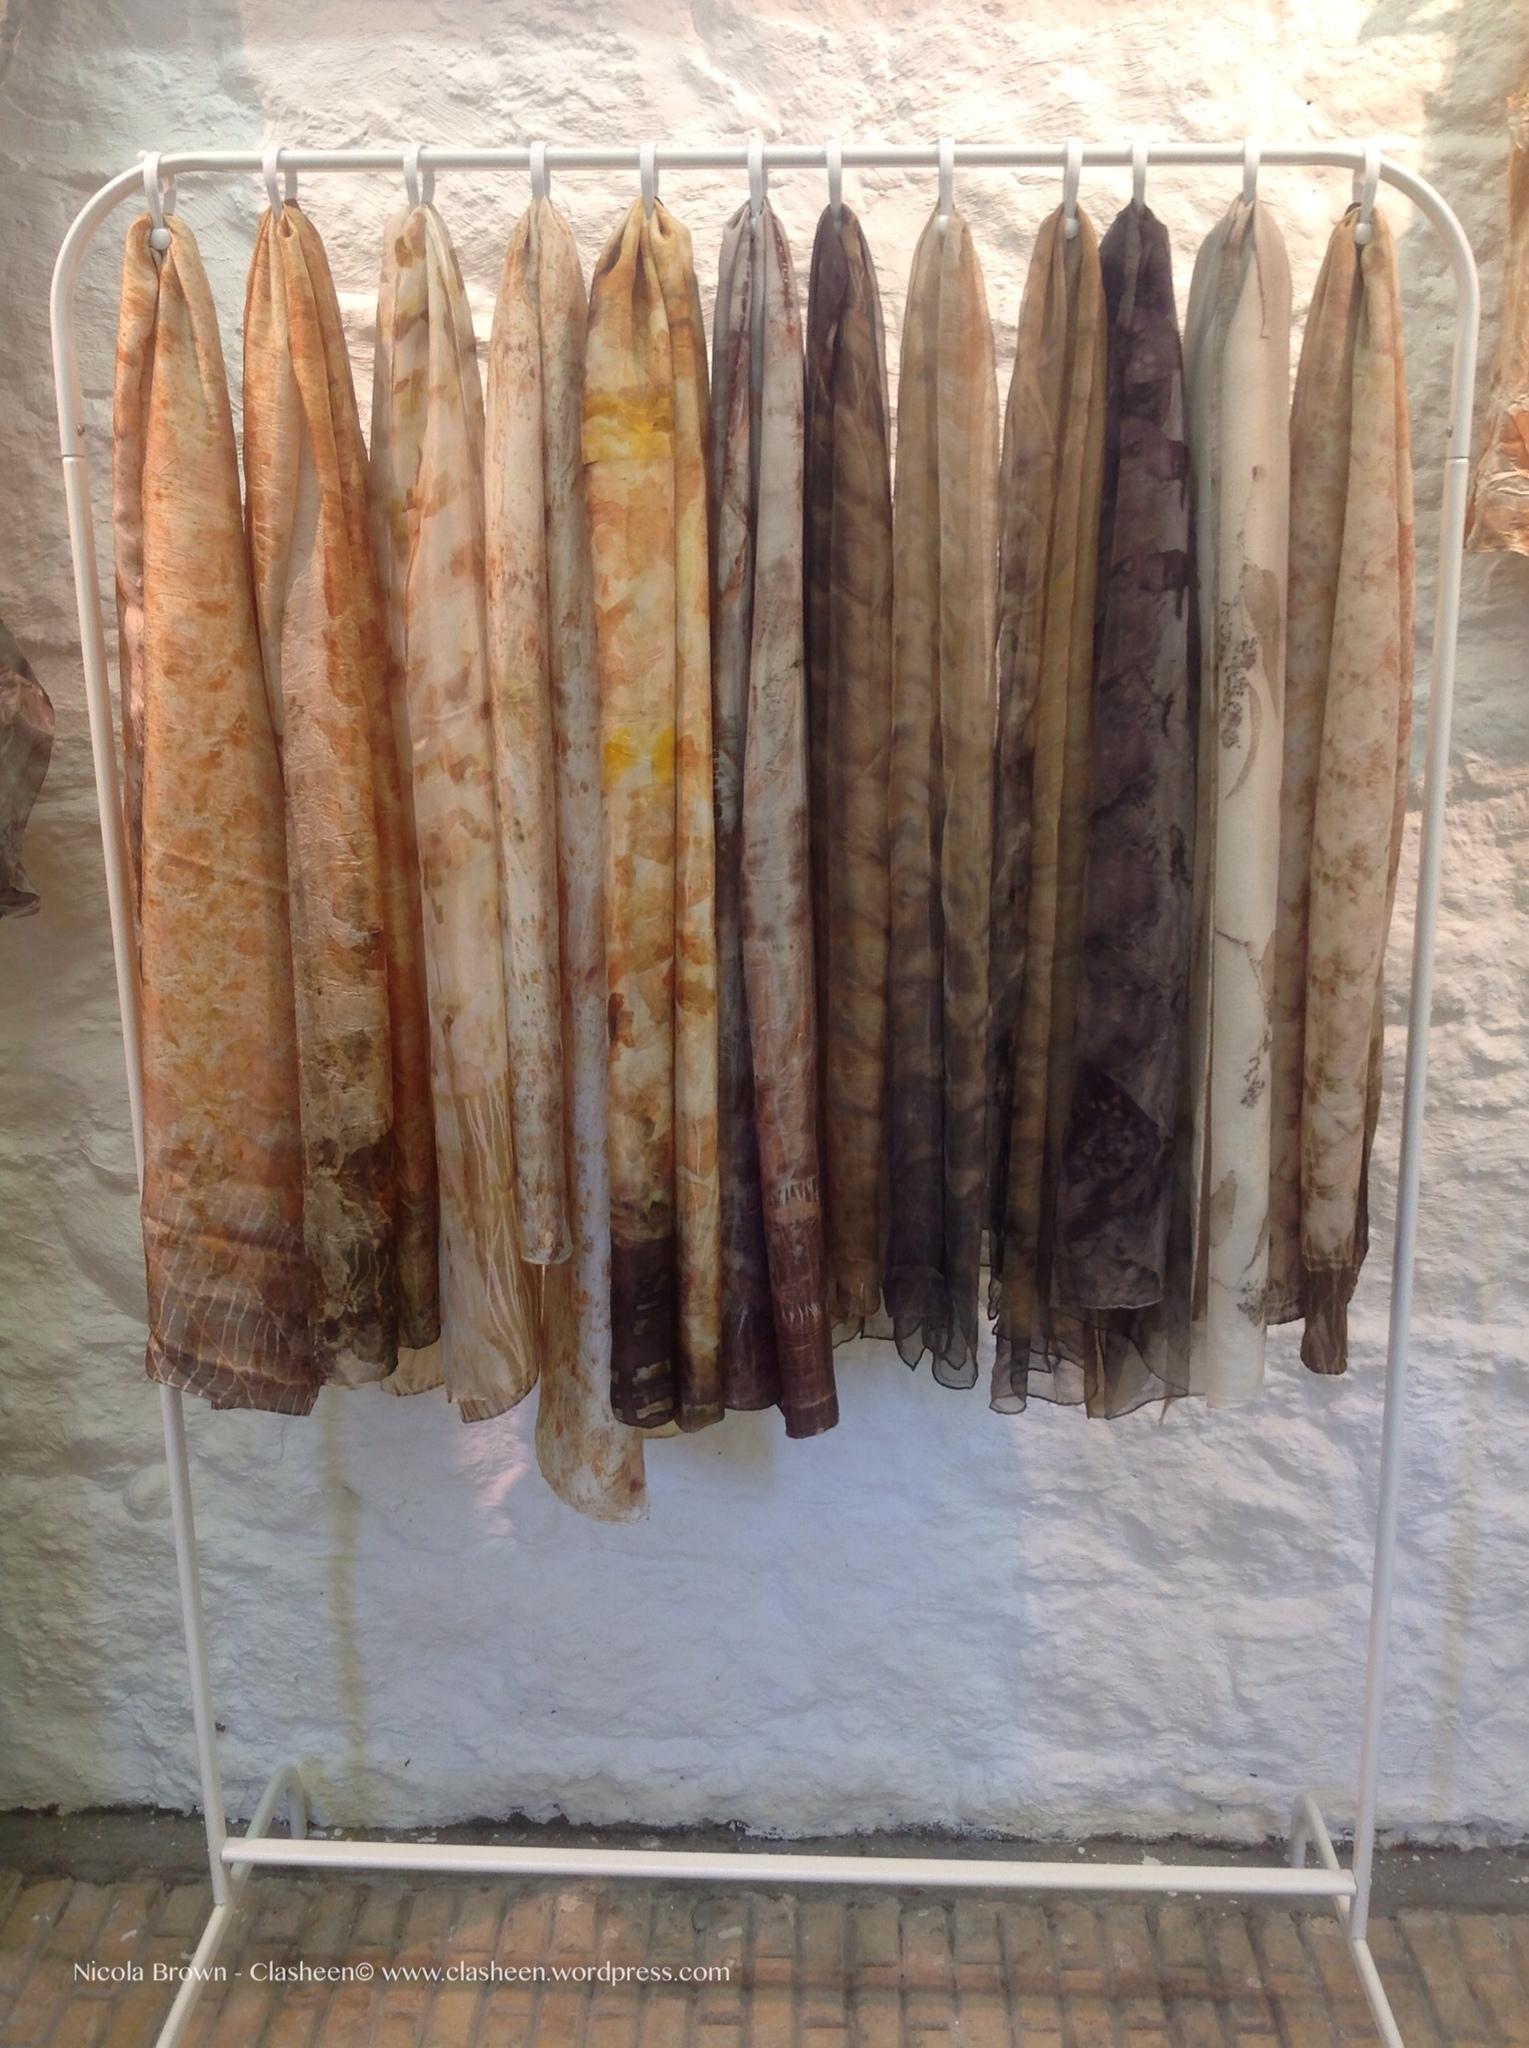 Craft Fair And Studio Scarf Display Diy Nicola Brown Fine Art Textiles